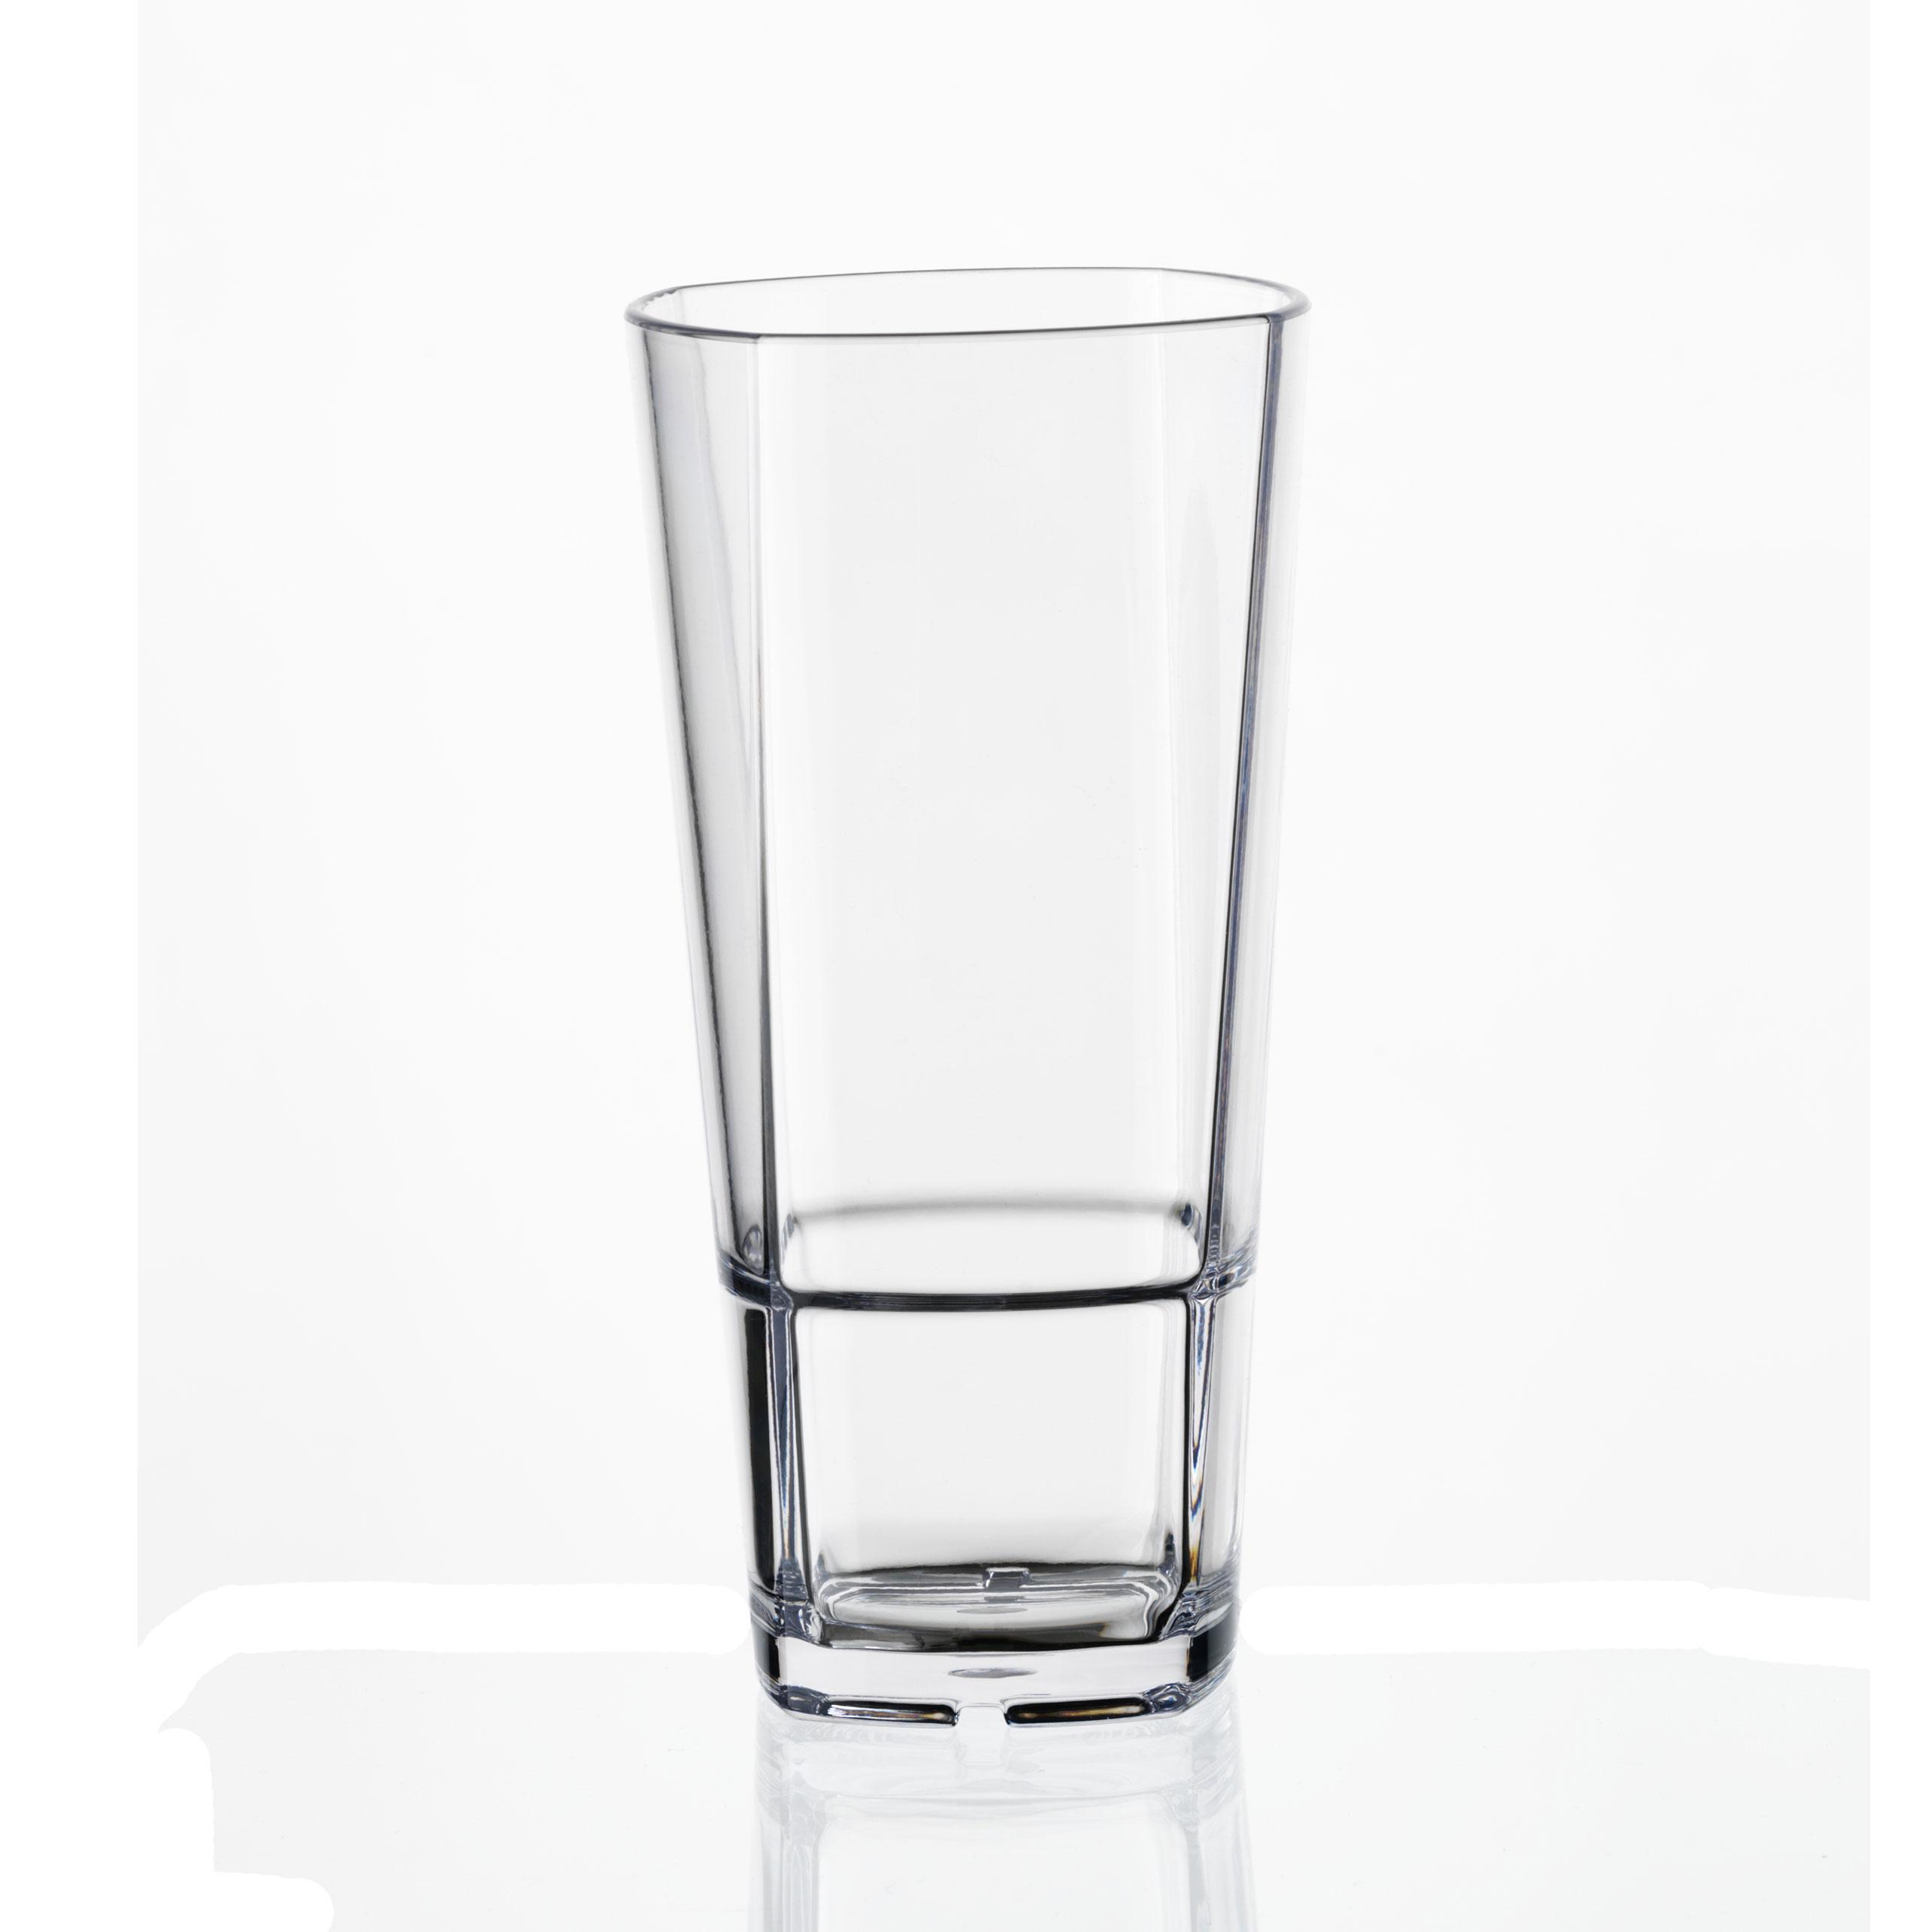 Libbey Glass 92444 glassware, plastic